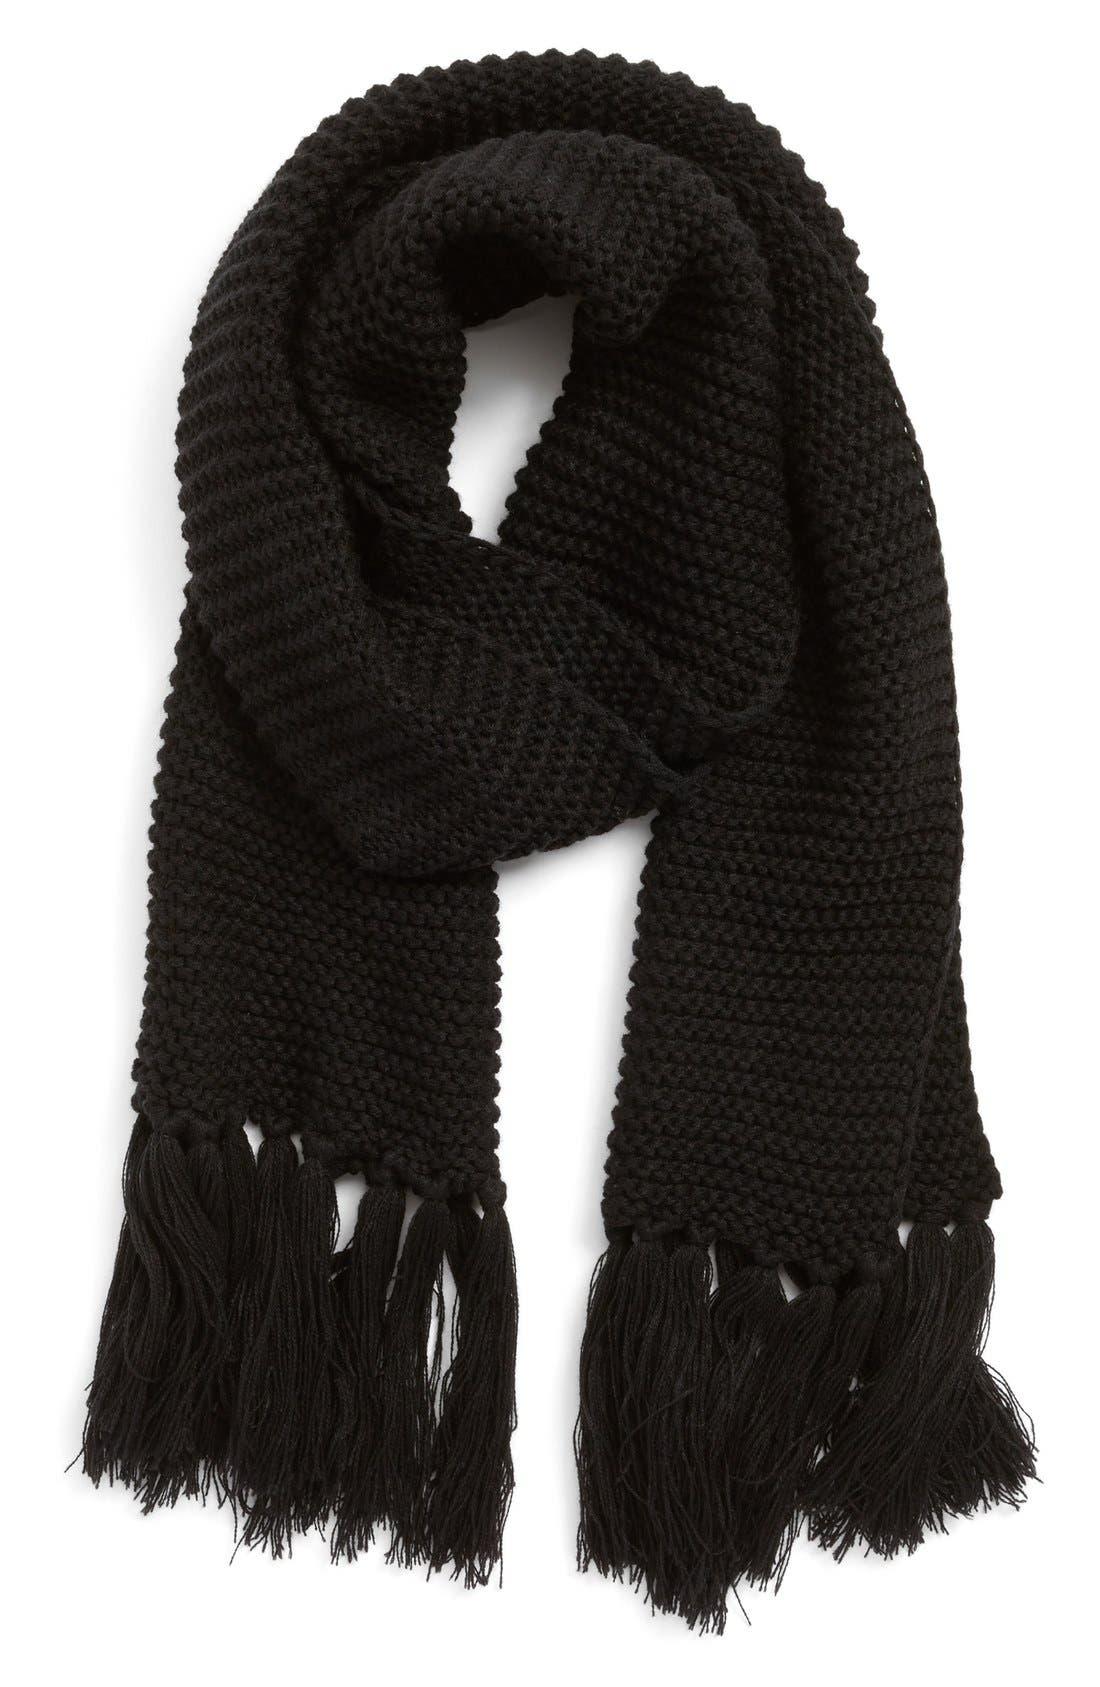 Main Image - Modena Chunky Knit Scarf